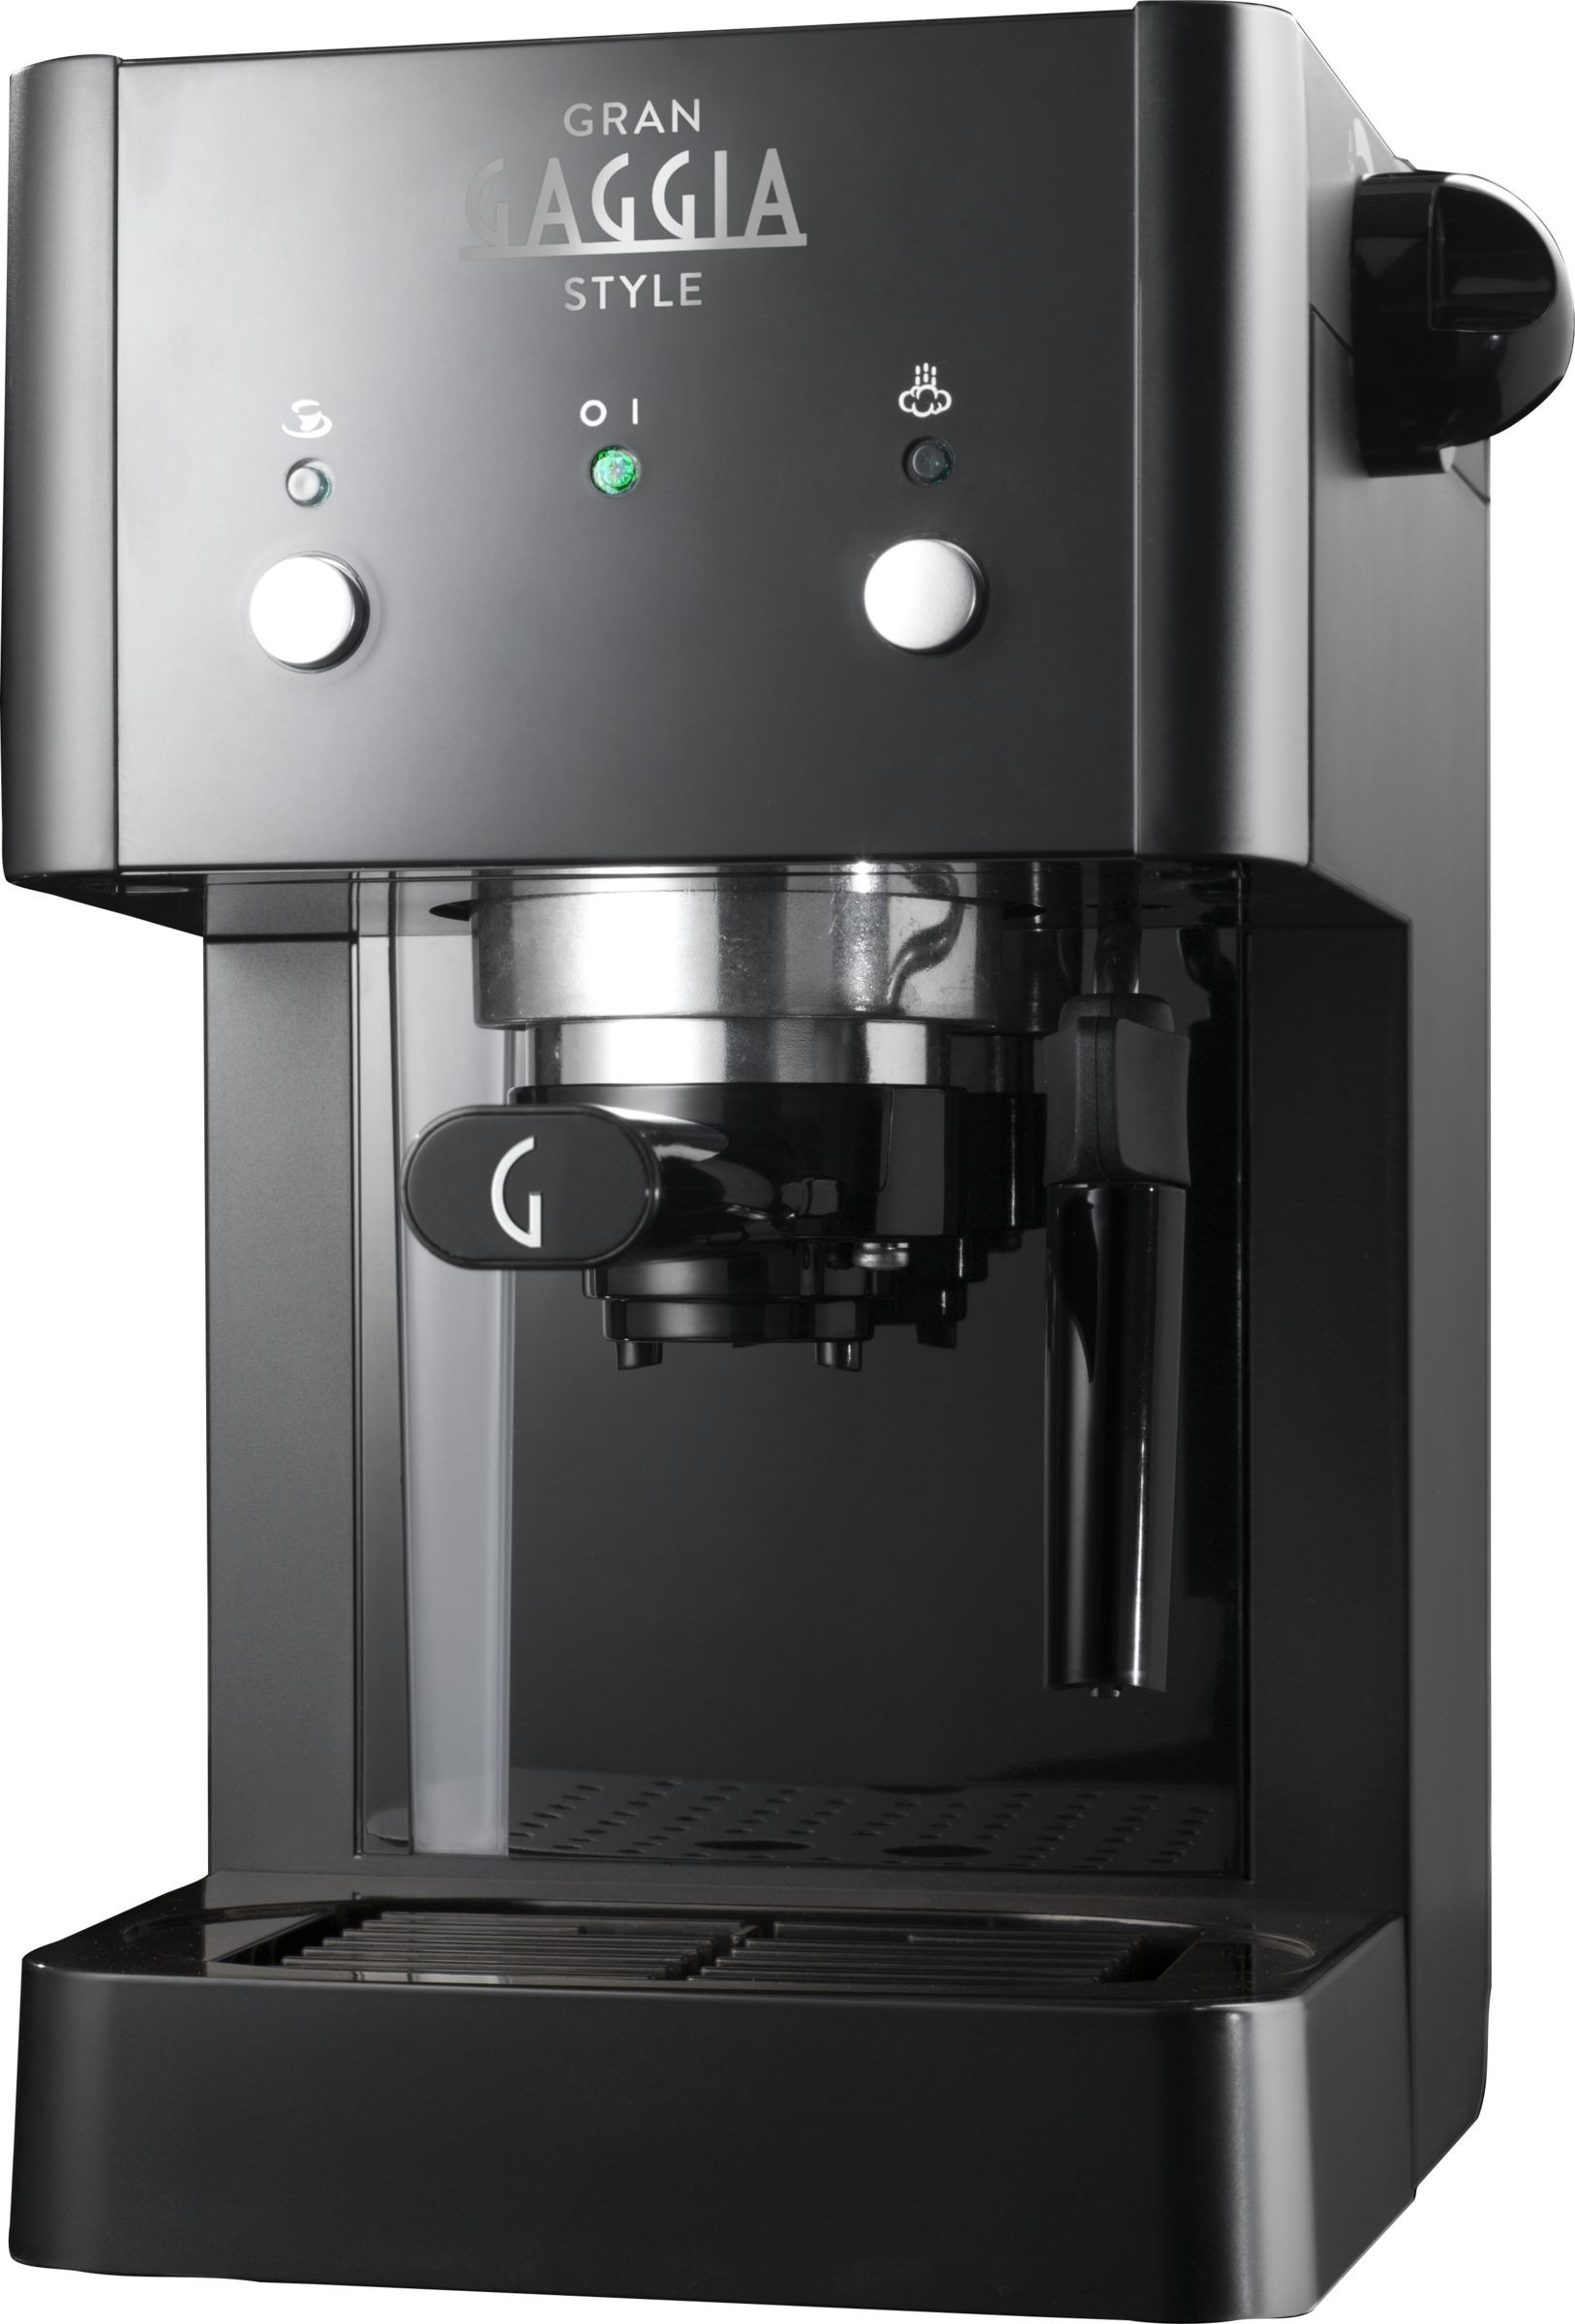 Gaggia espresso apparaat Gran zwart